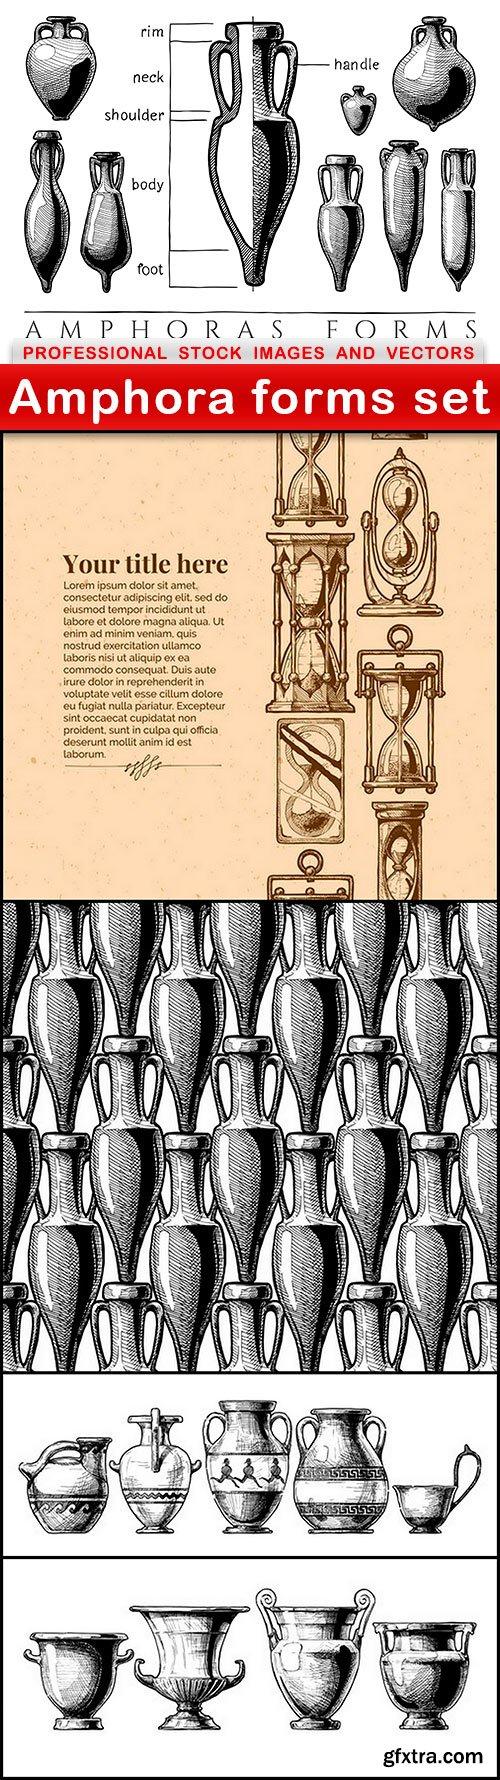 Amphora forms set - 5 EPS